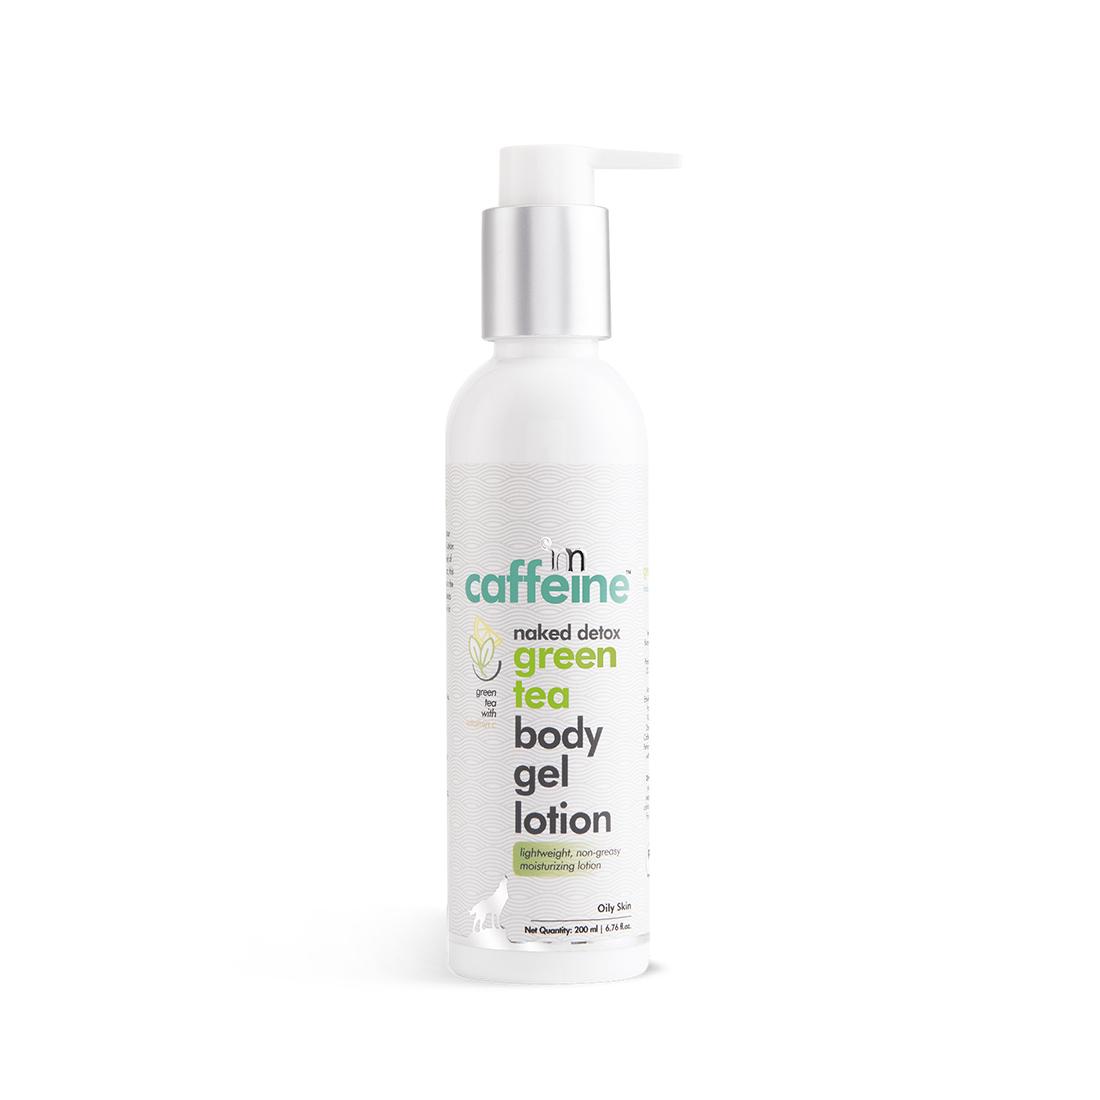 MCaffeine   mCaffeine Naked Detox Hydrating Green Tea Body Gel Lotion (200 ml)